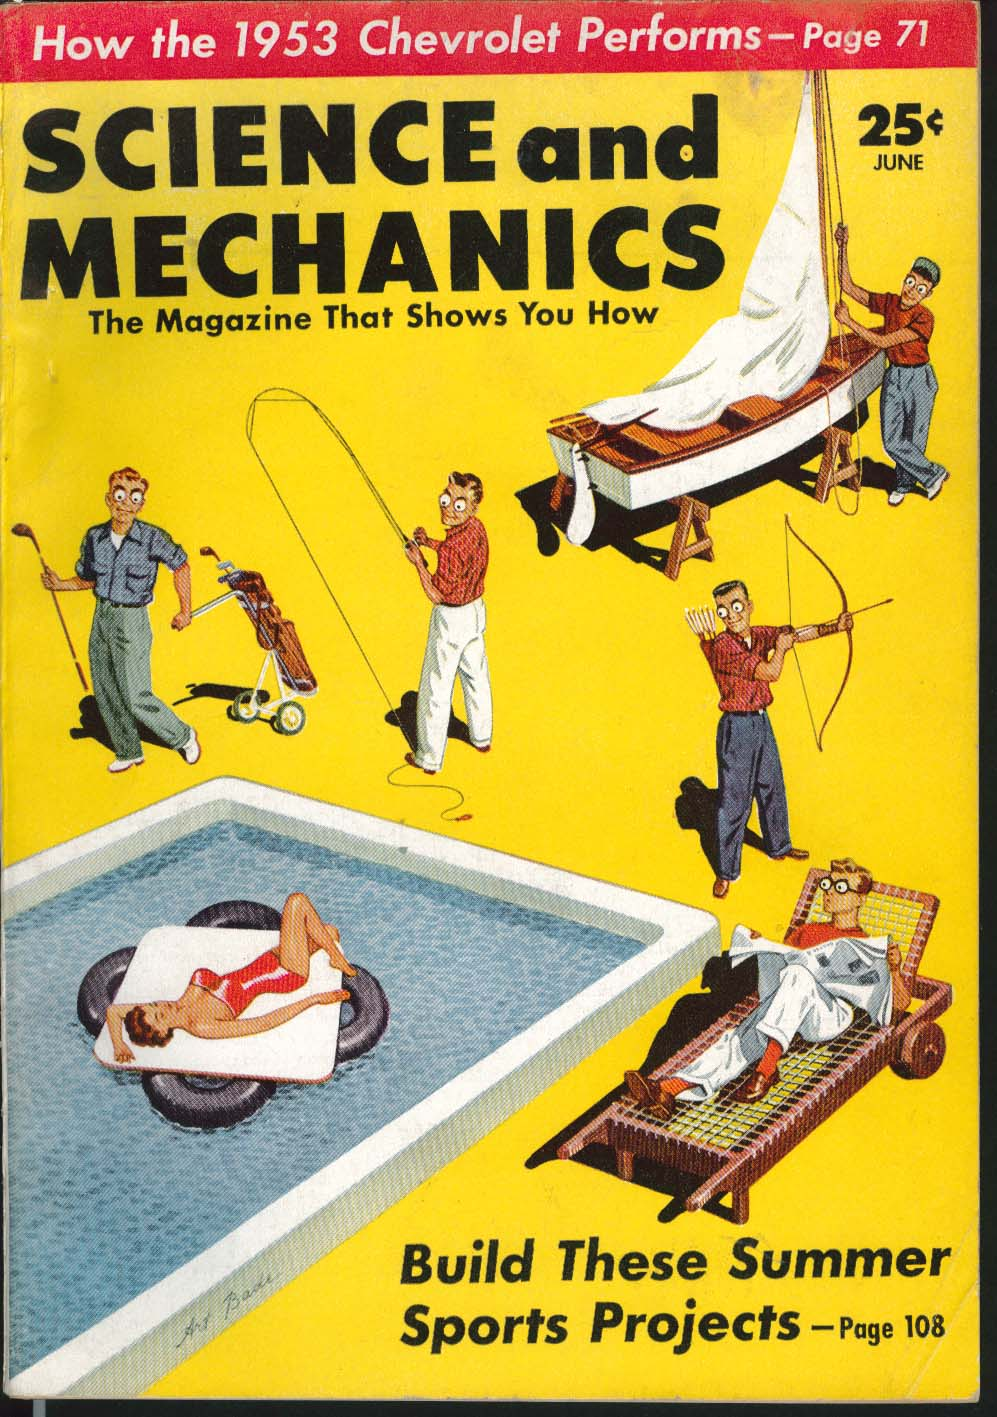 SCIENCE & MECHANICS Chevrolet Two-Ten De Soto Fire Dome 8 road tests 6 1953